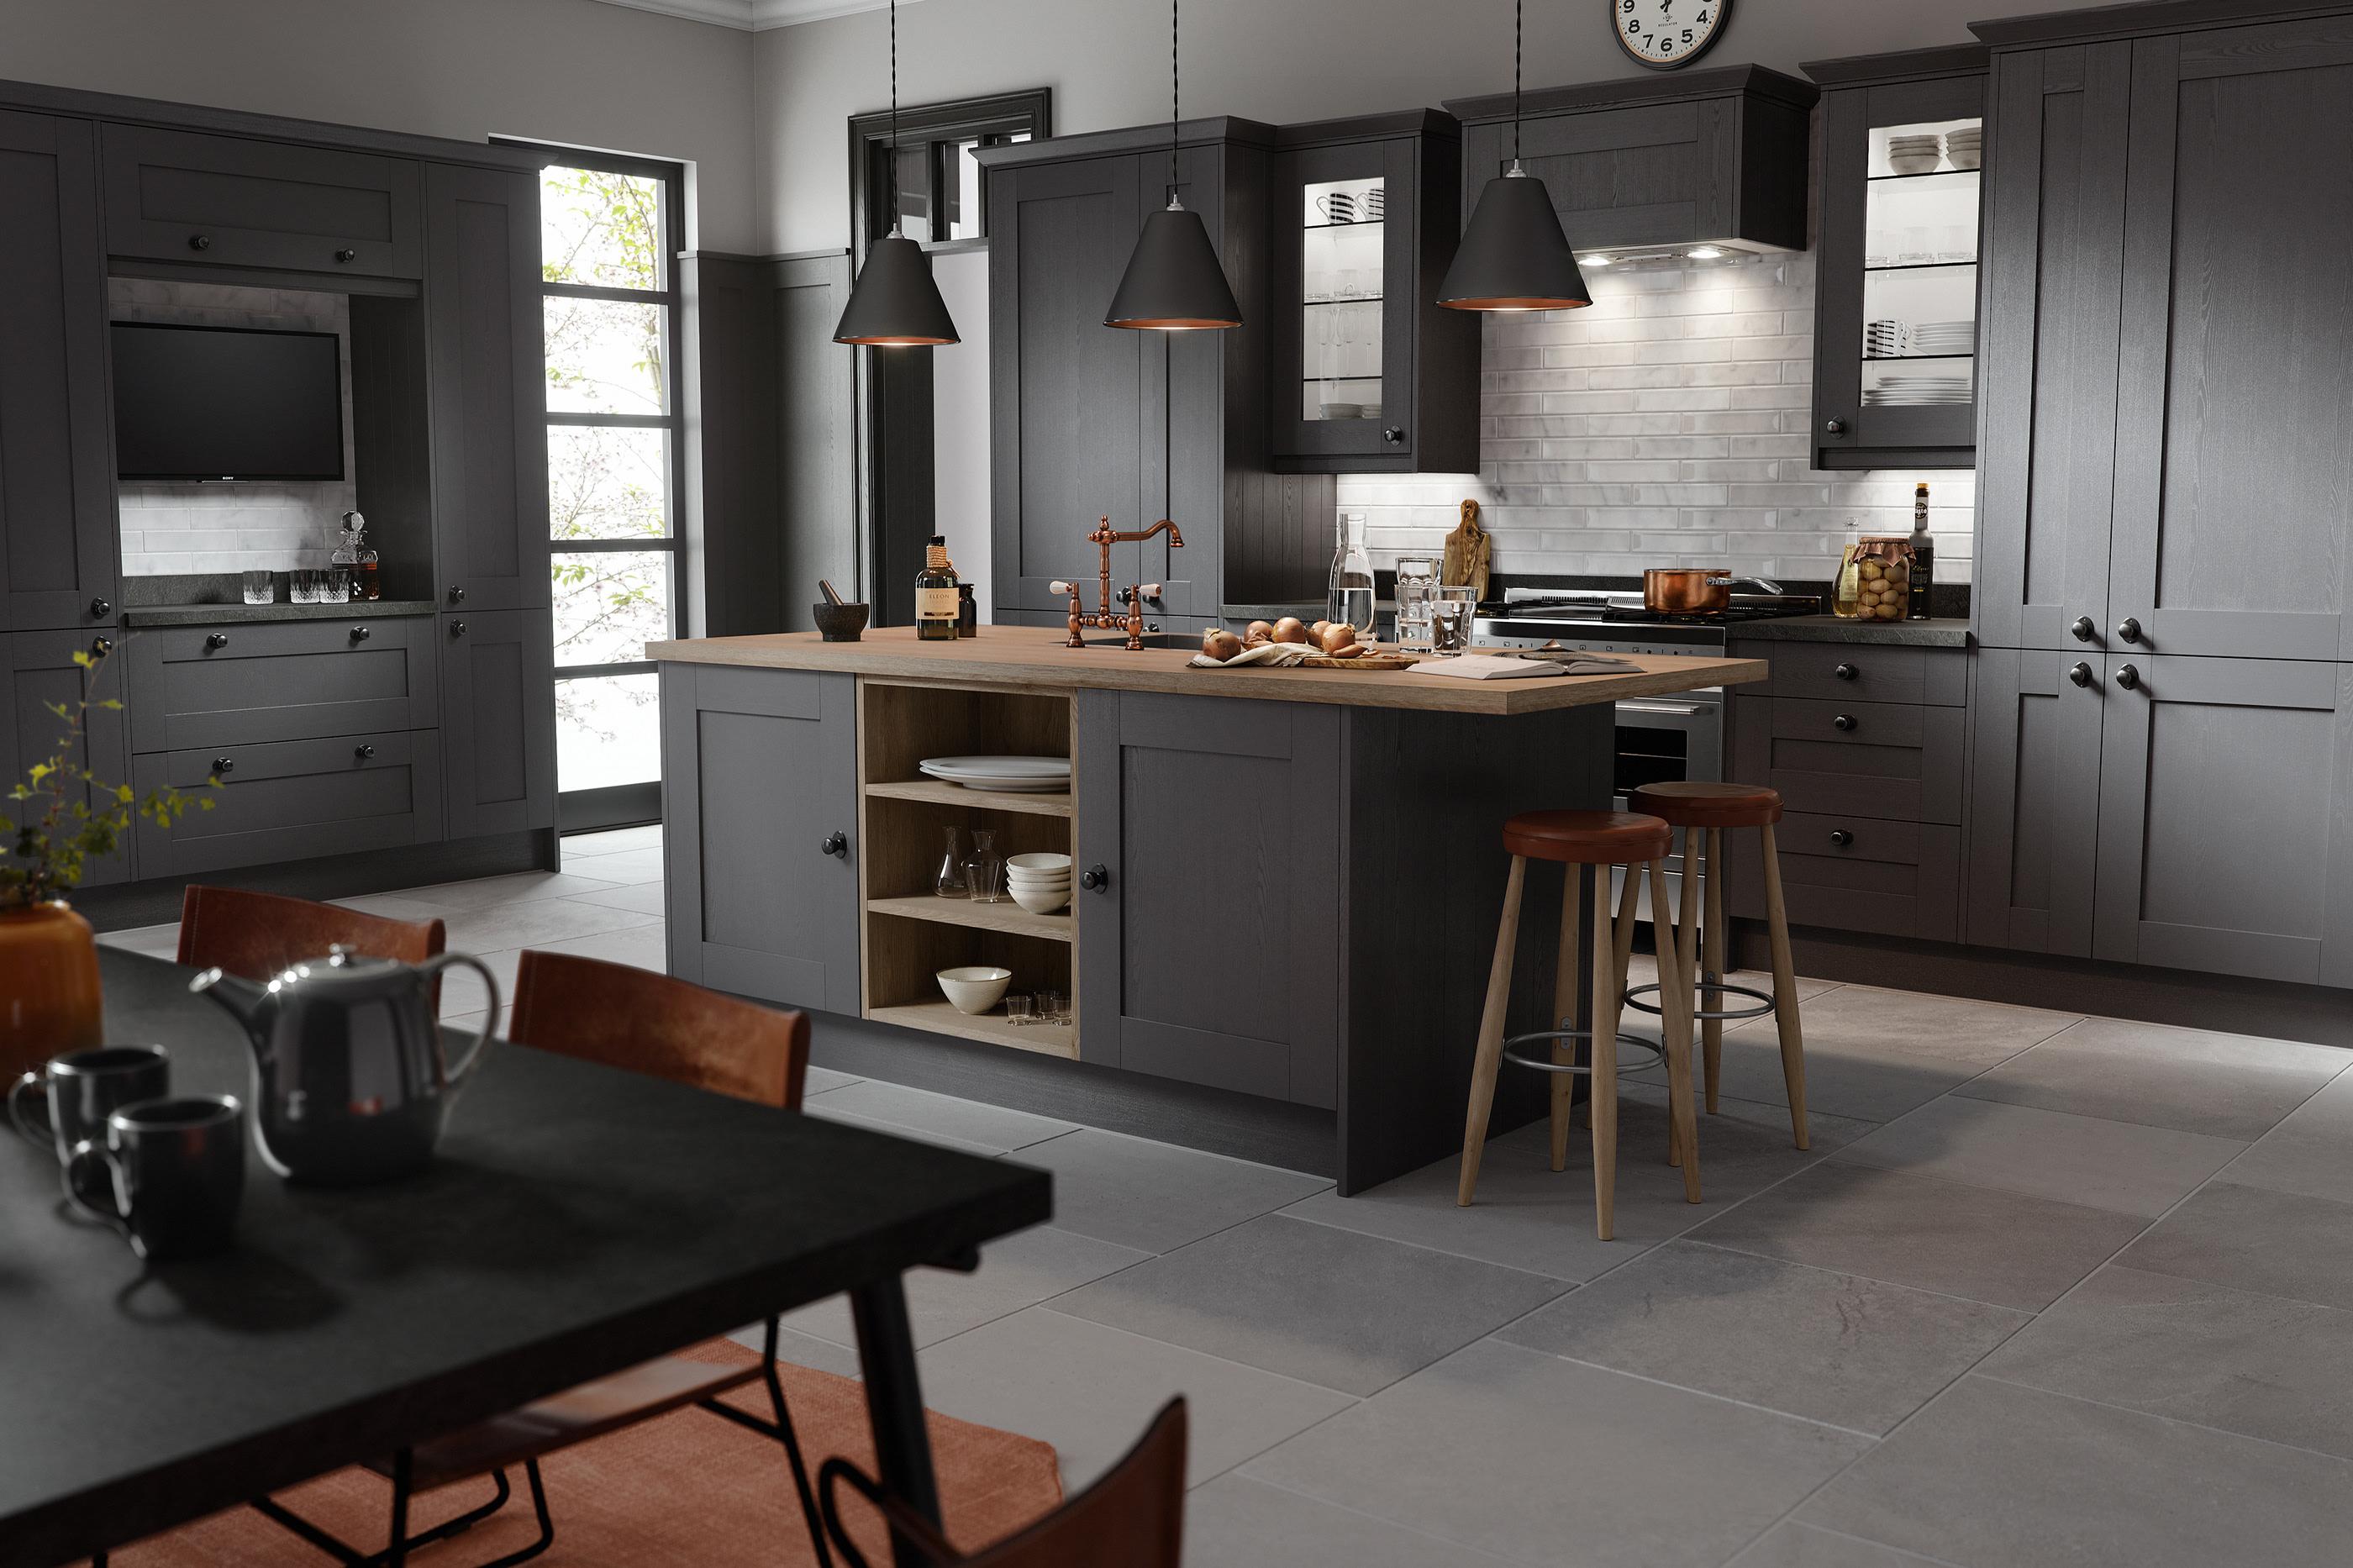 Wren 9 CG Kitchen Projects on Behance